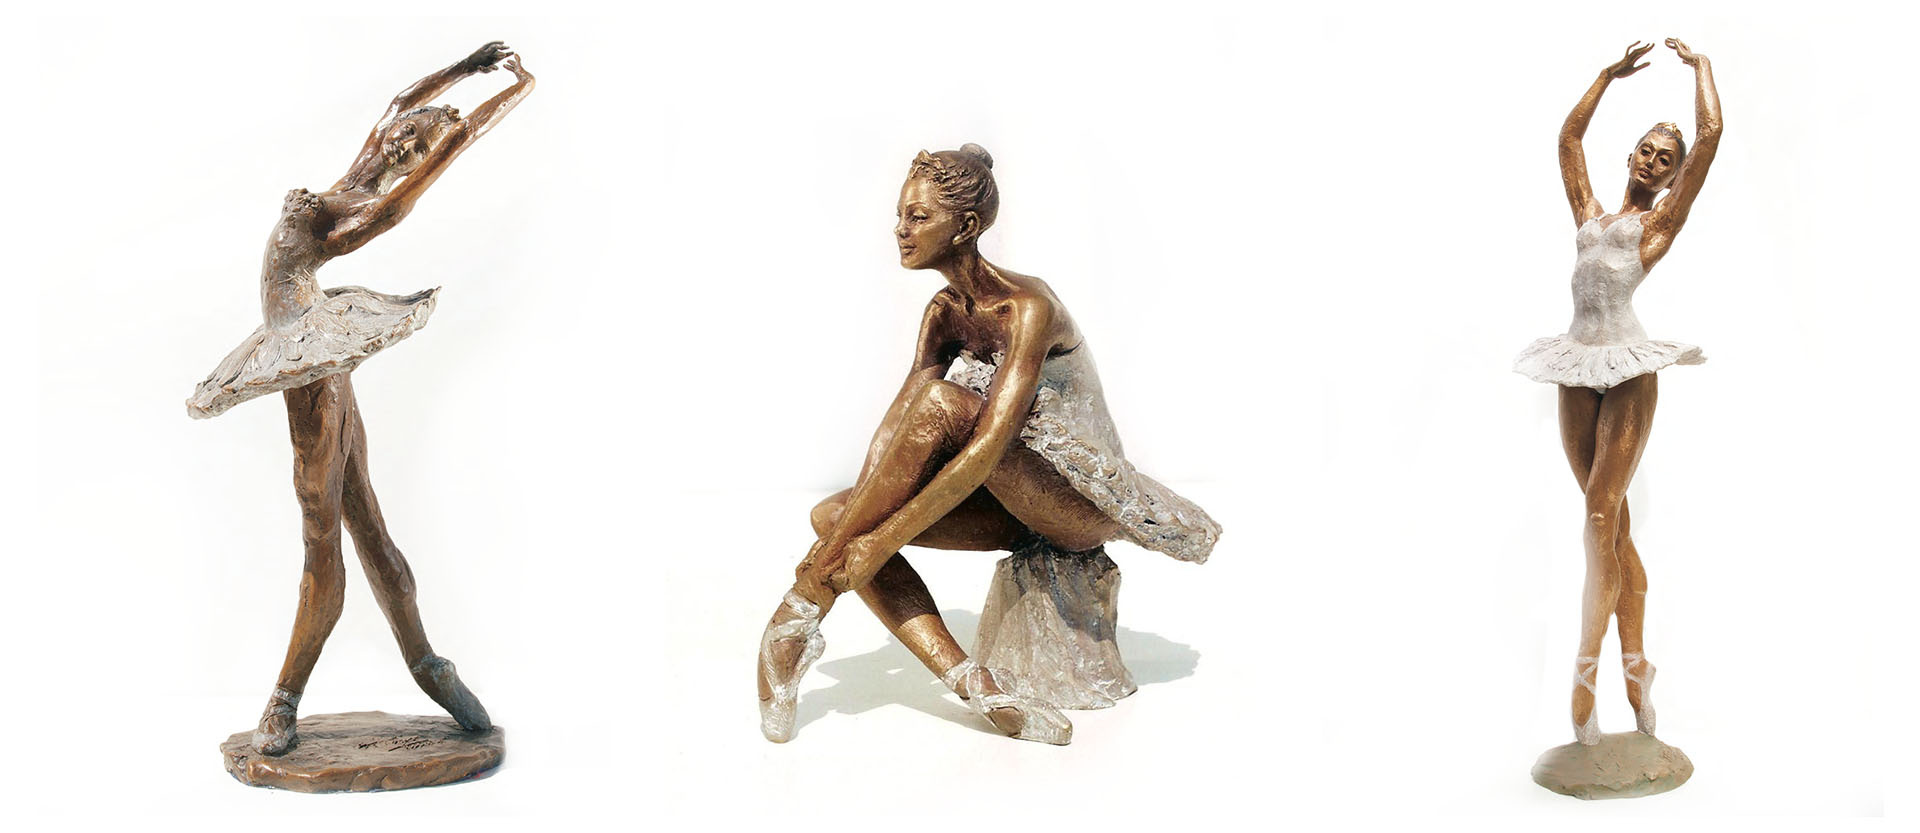 statues-of-women-sculptures-woman-ballerinas-bronze-cover-01